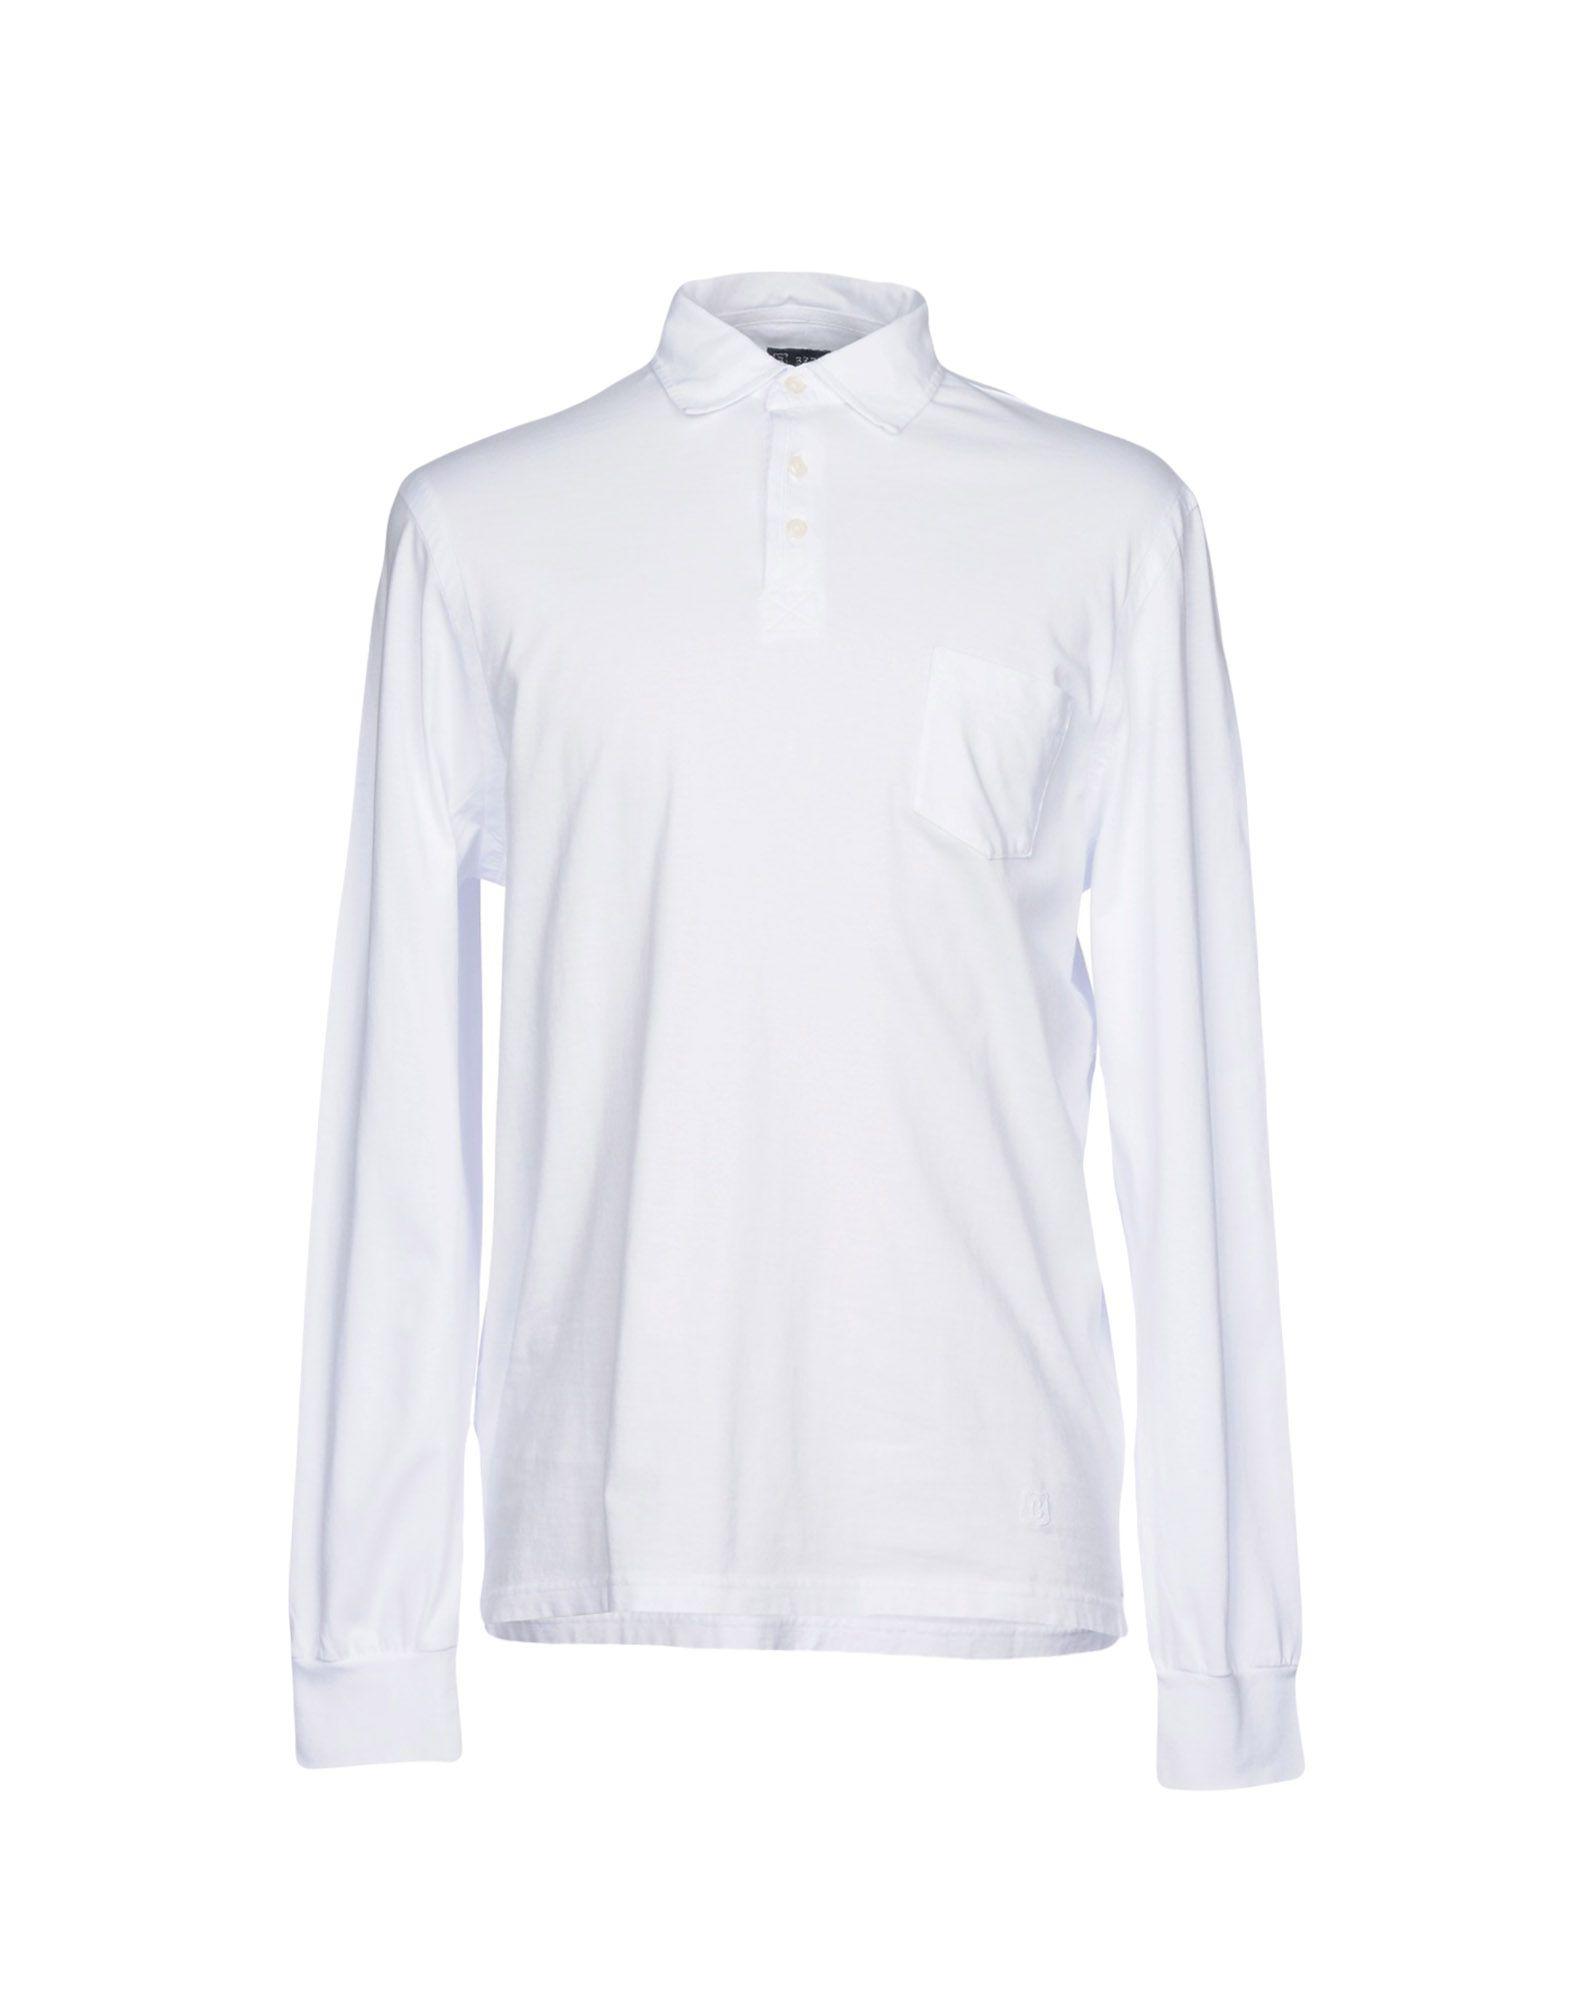 BREUER Polo Shirt in White